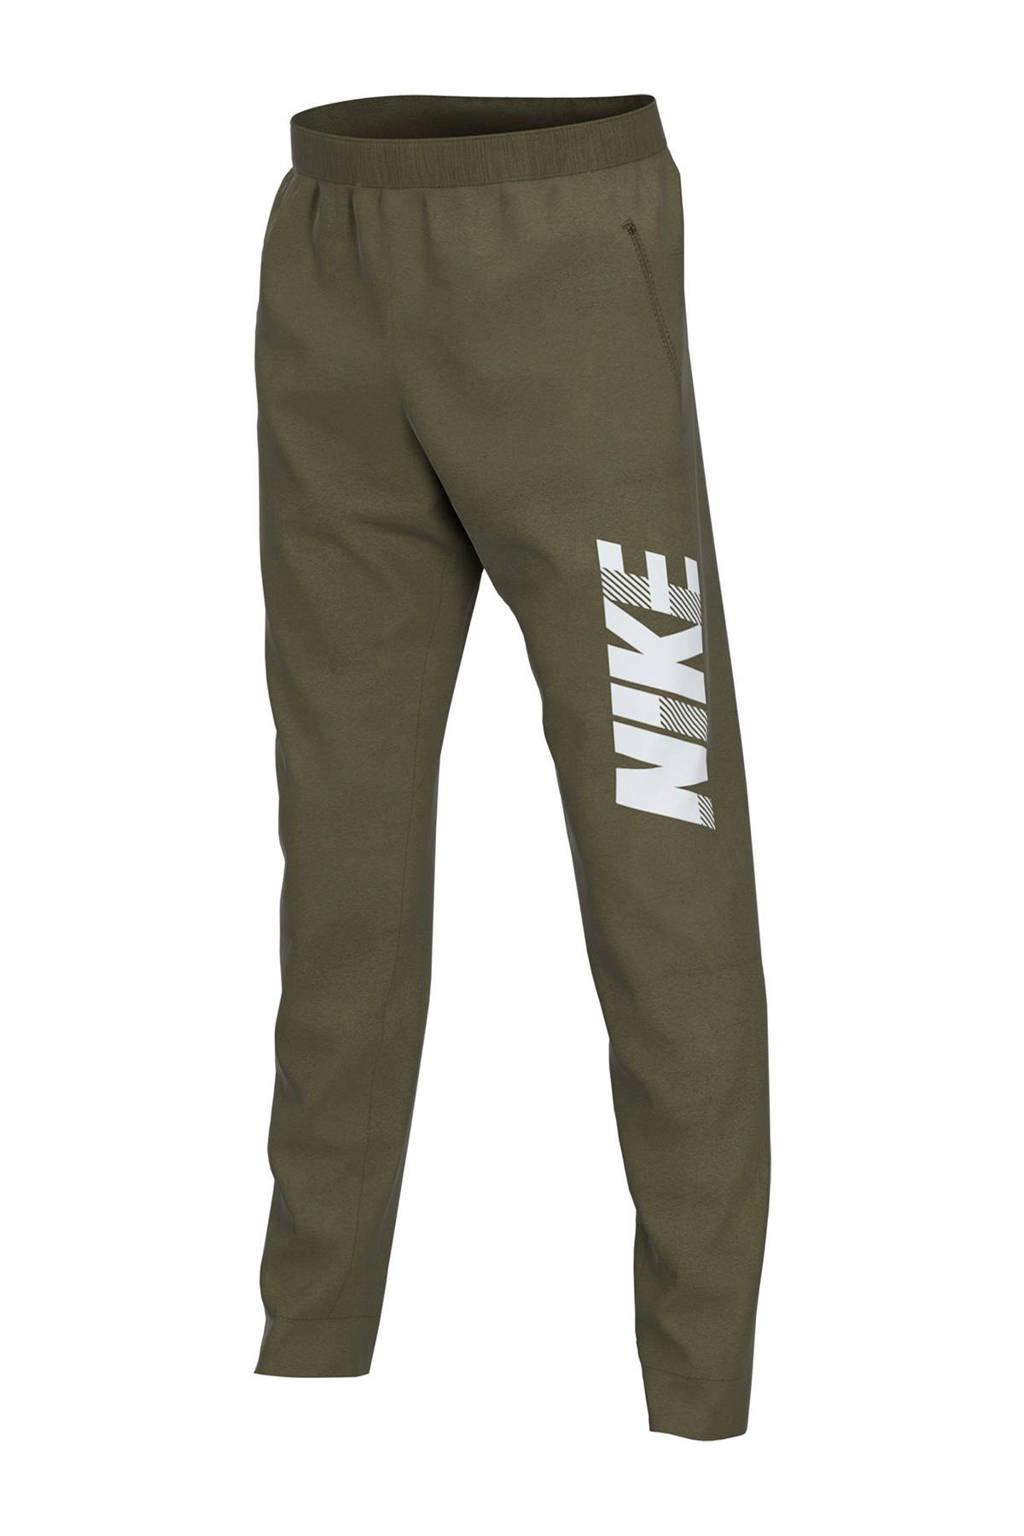 Nike   sportbroek kaki, Kaki